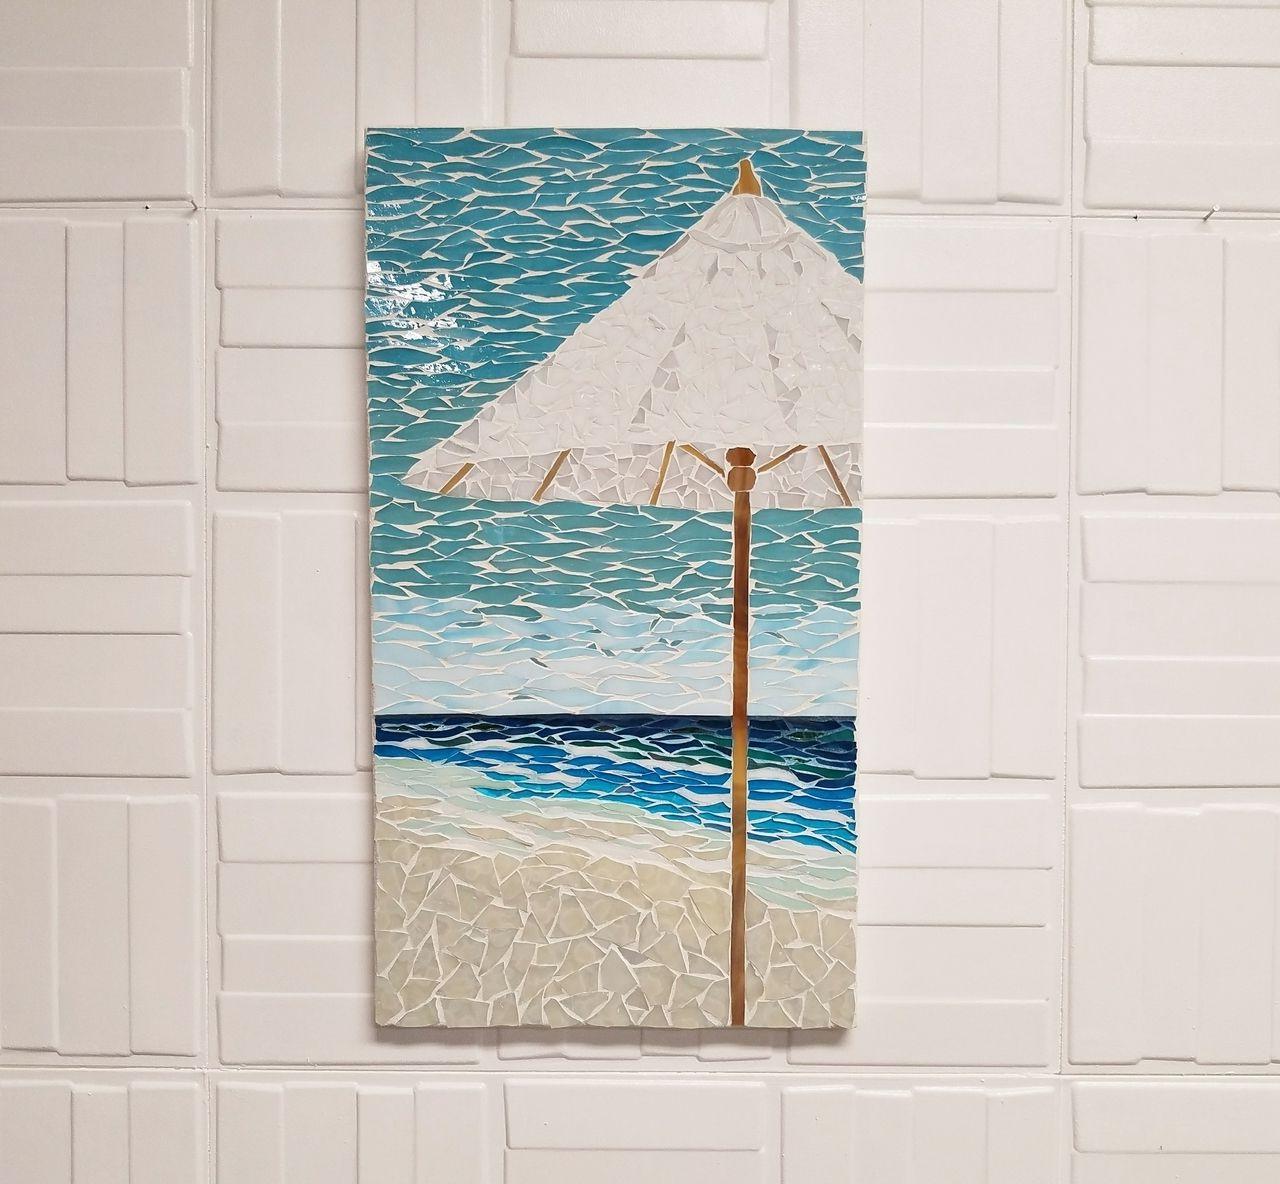 Coastal Art White Umbrella Mosaic, Beach House Art, Beach Scene Art Pertaining To Best And Newest Capra Beach Umbrellas (View 7 of 20)